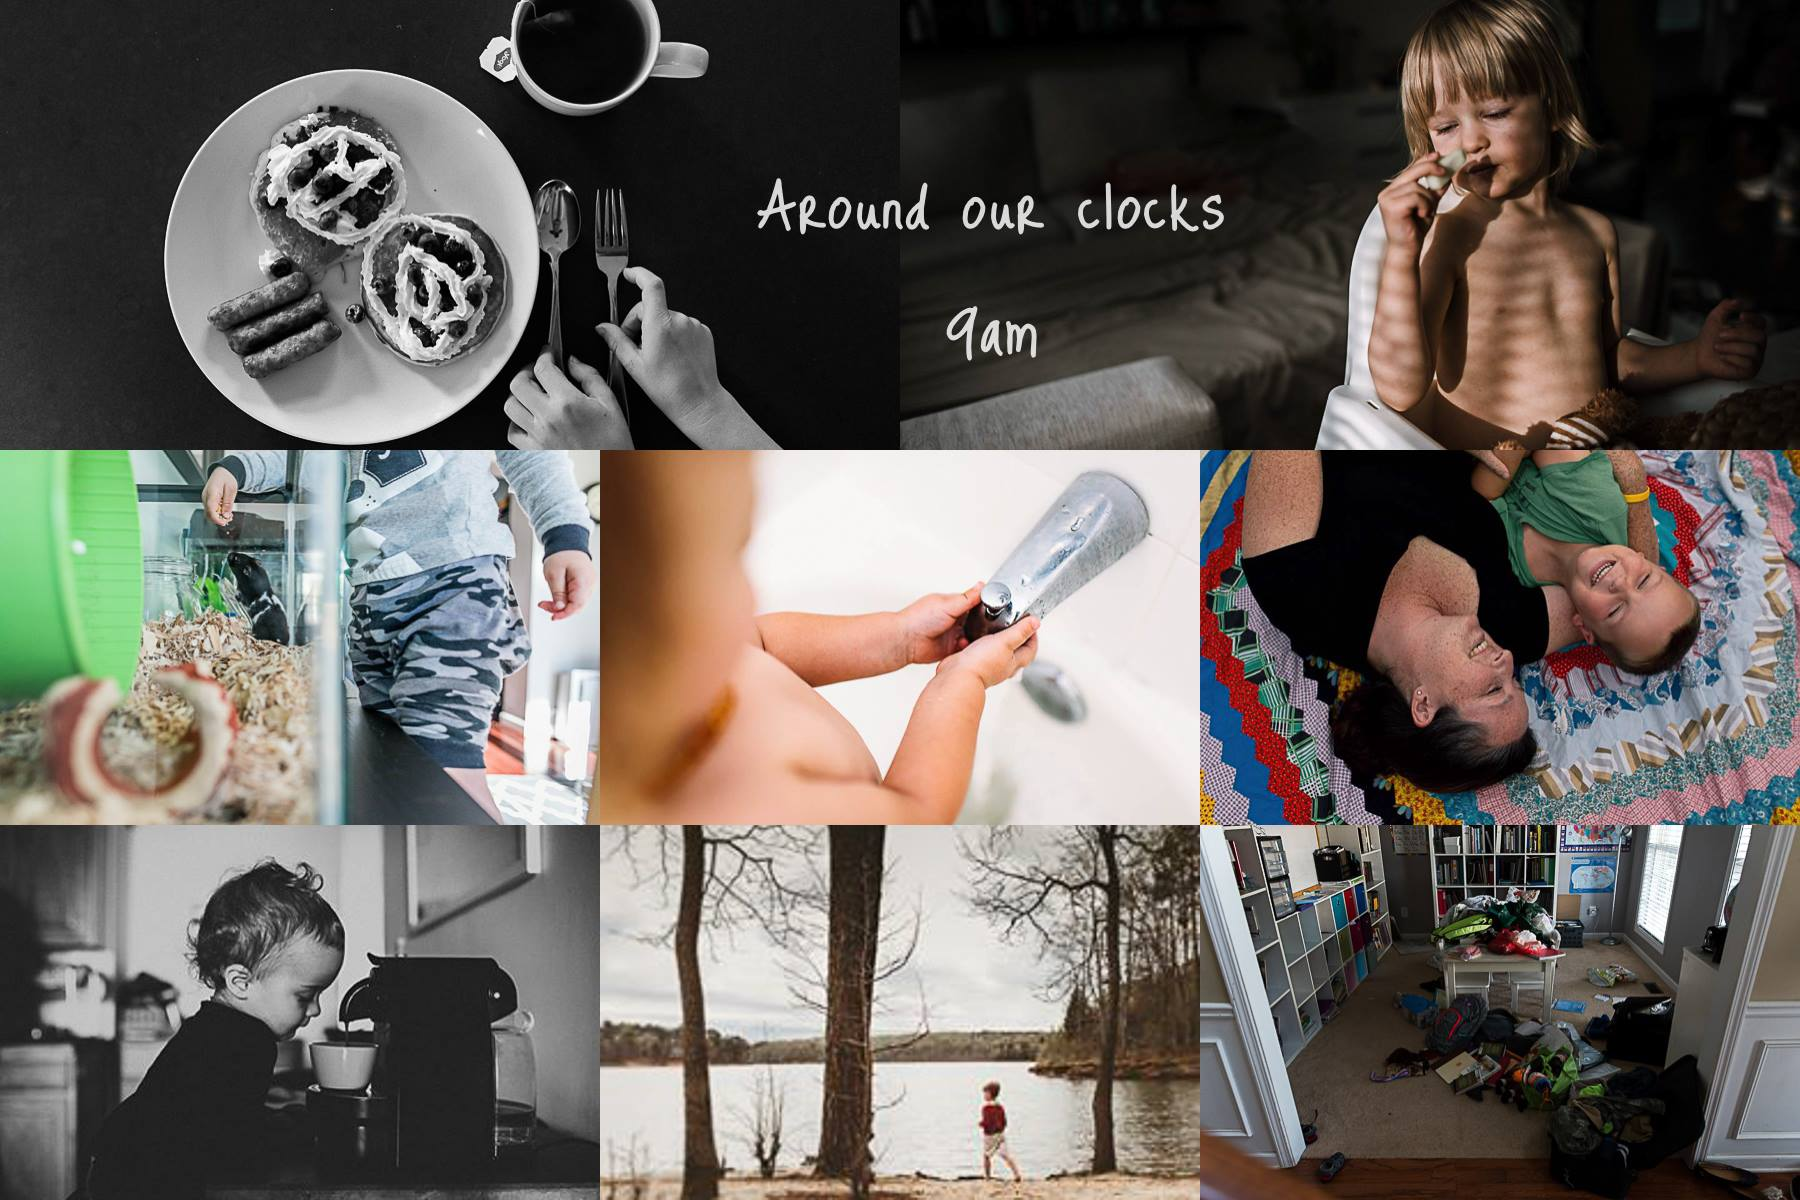 around our clock